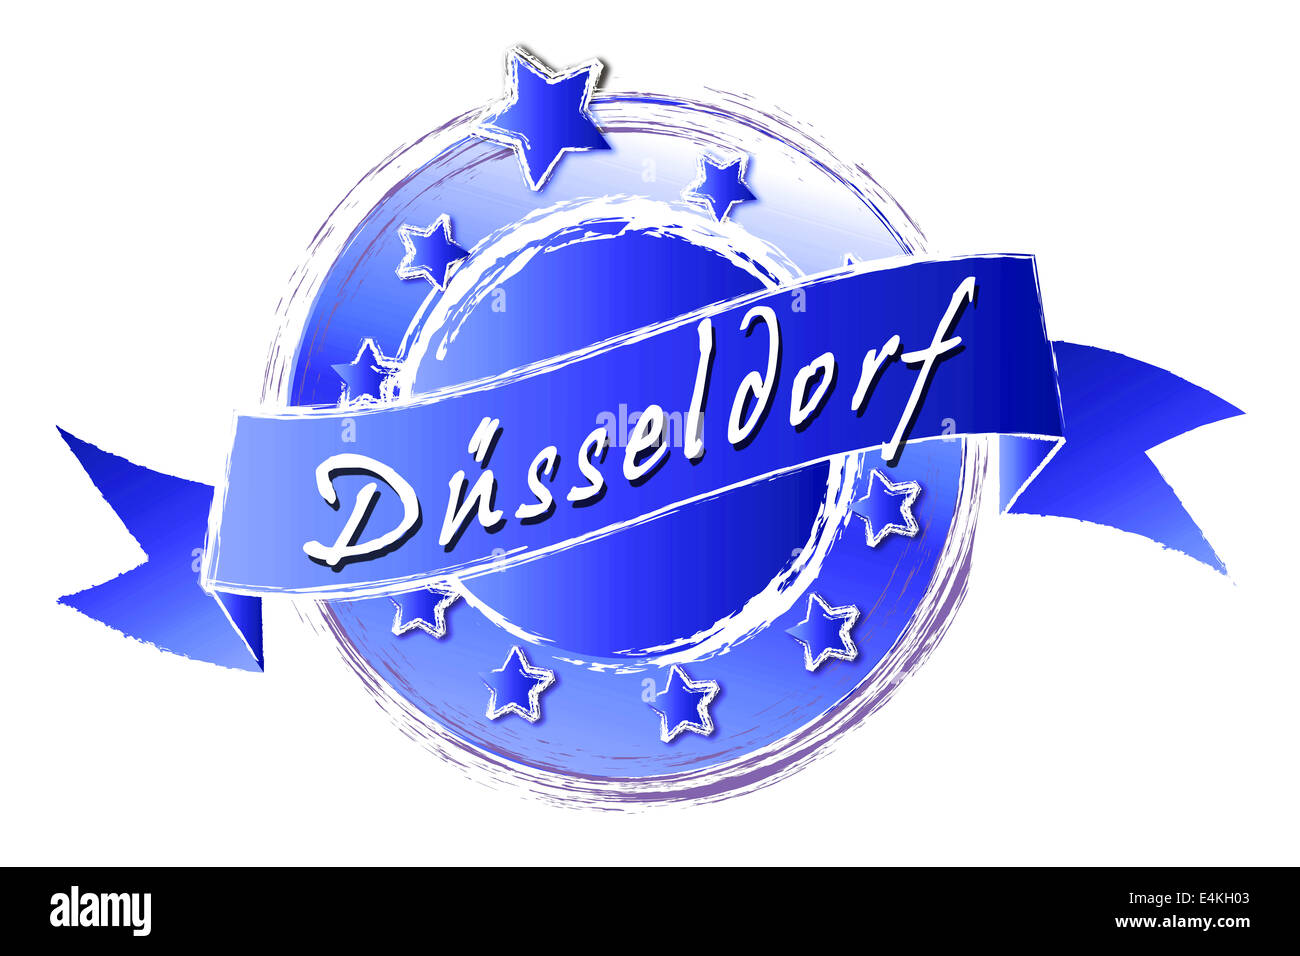 Royal Grunge - DÜSSELDORF - Stock Image